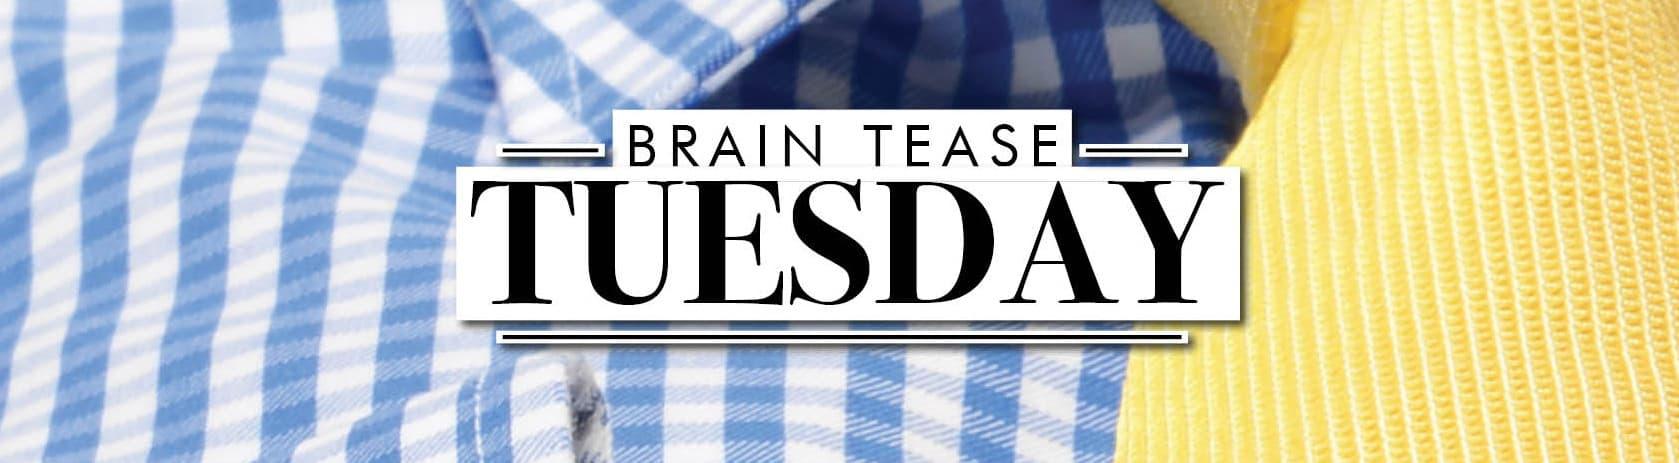 Brain Tease Tuesday Week 22